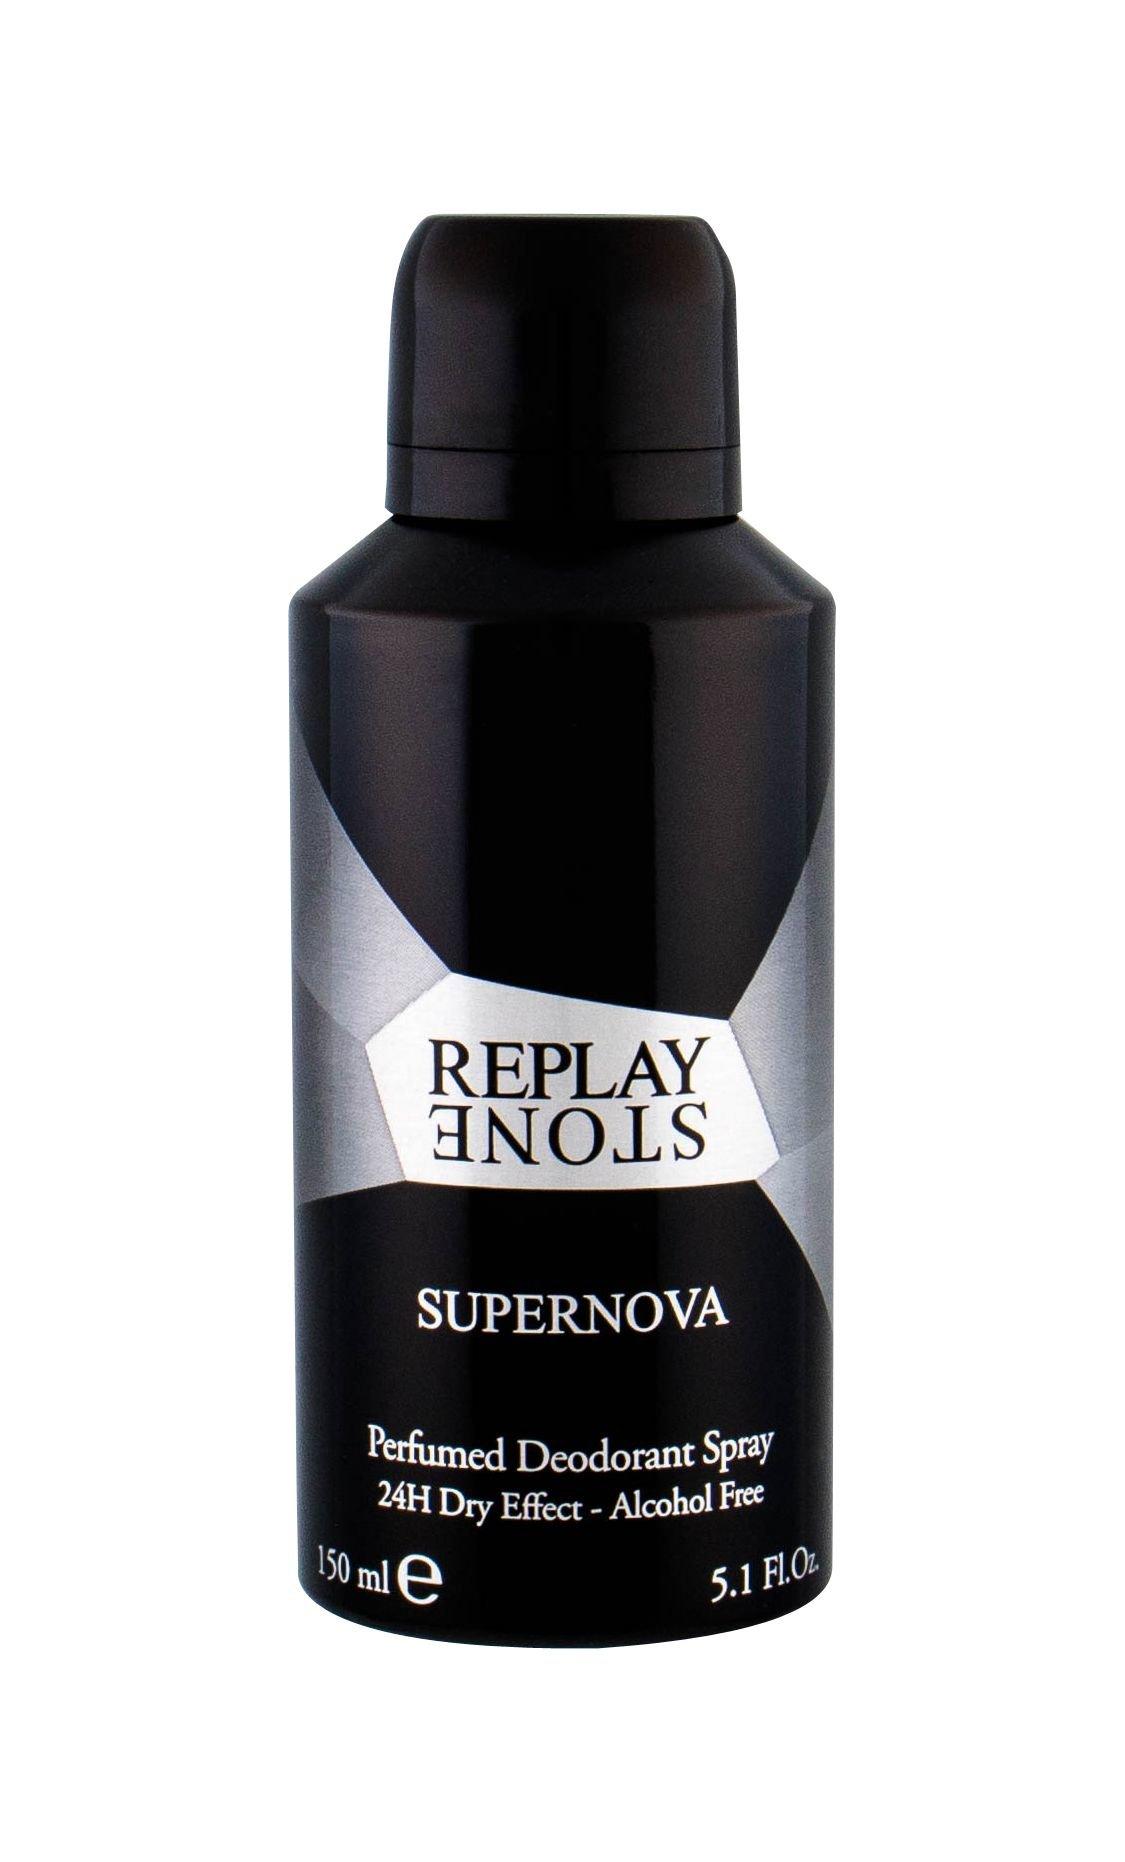 Replay Stone Supernova for Him Deodorant 150ml